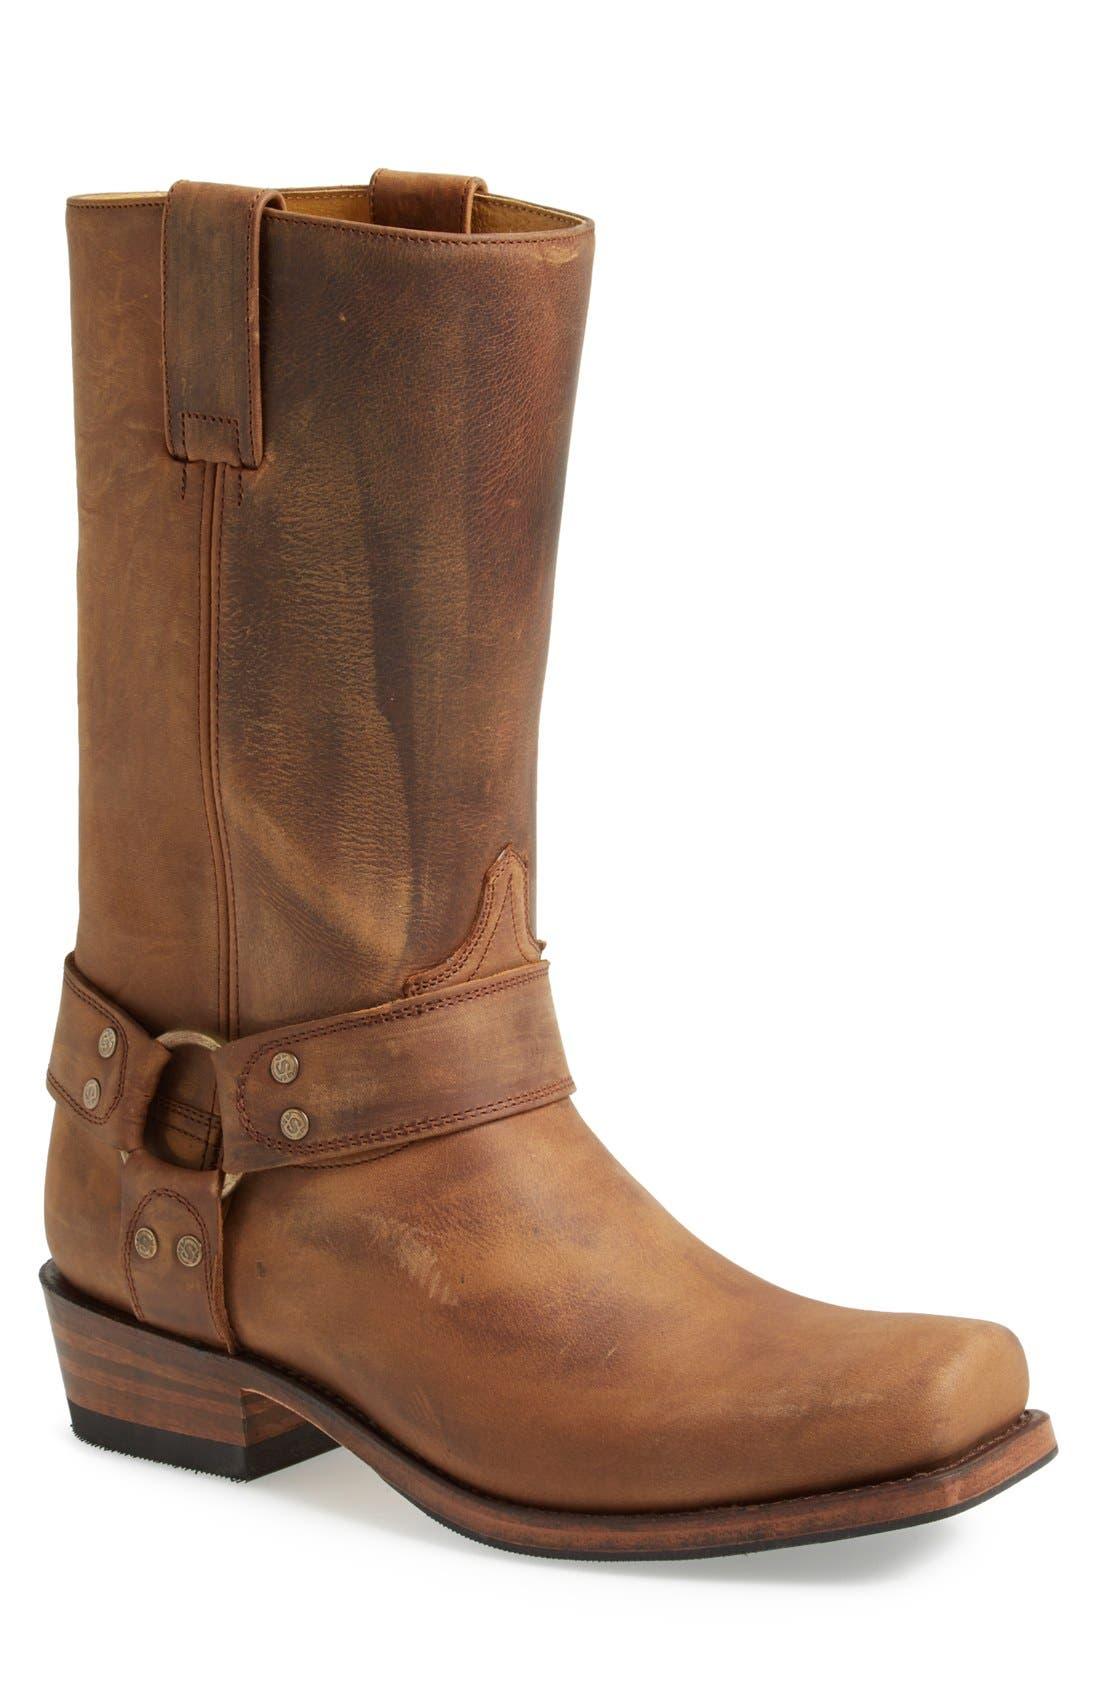 Main Image - Sendra Boots Tall Harness Boot (Men)